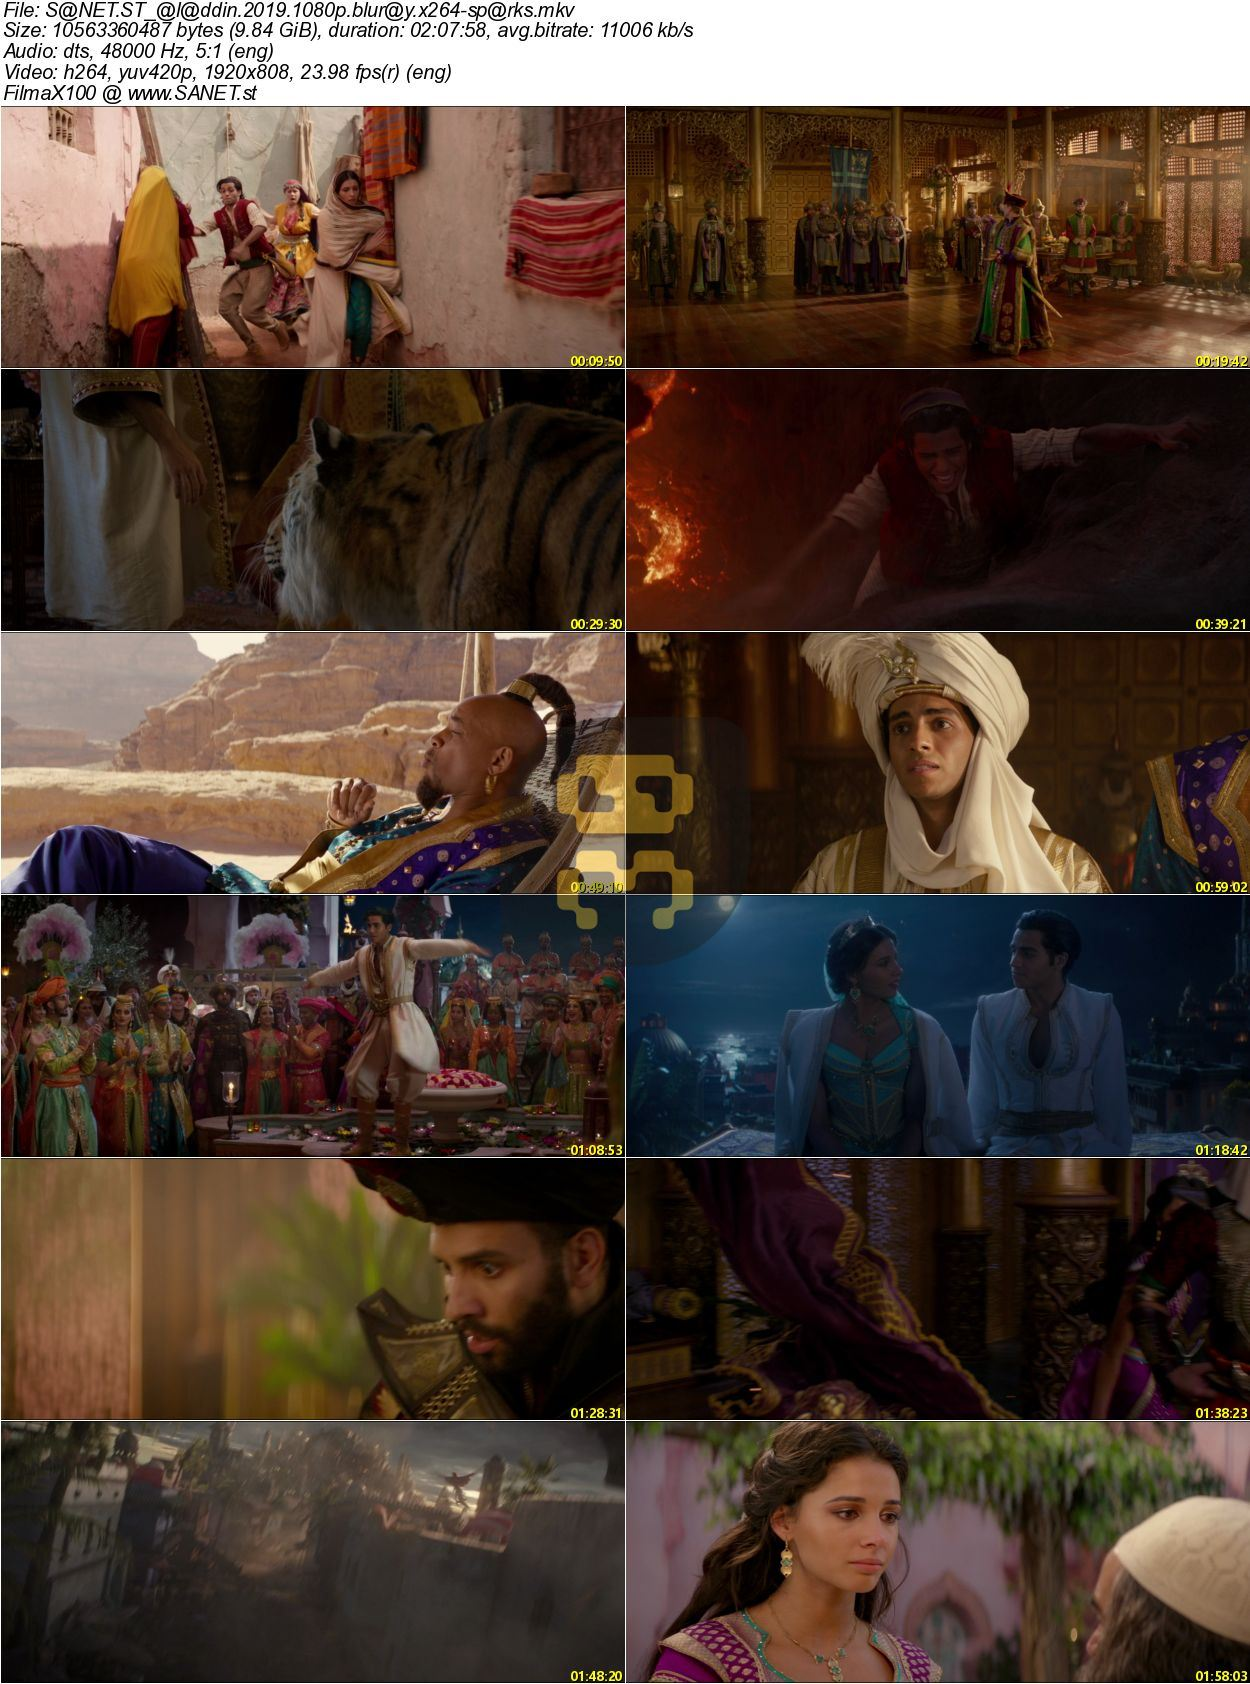 Aladdin 2019 Aladdin Movie With Farsi Subtitle 2019-08-25